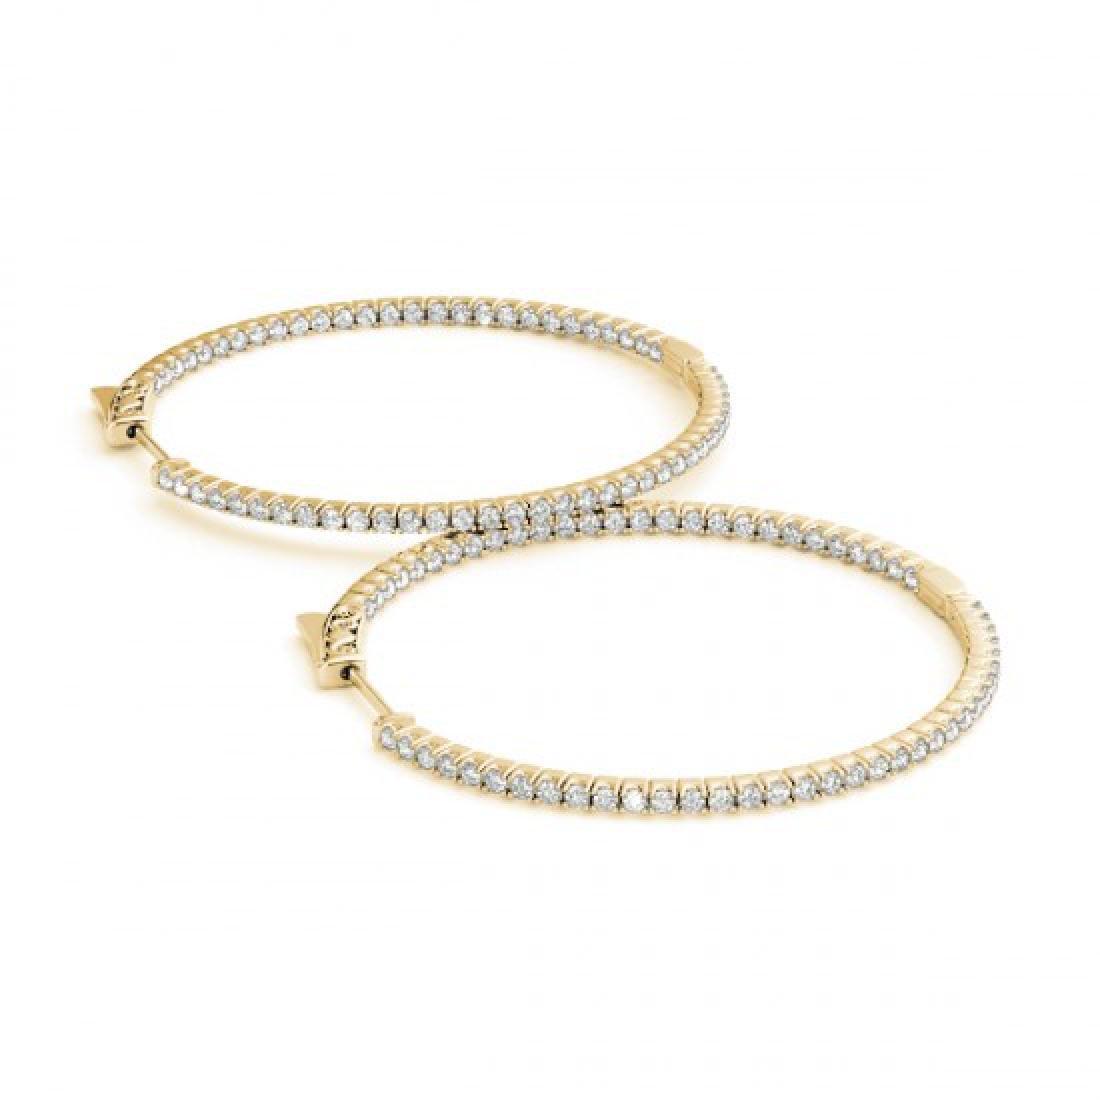 2 CTW Diamond VS/SI Certified 52 Mm Hoop Earrings 14K